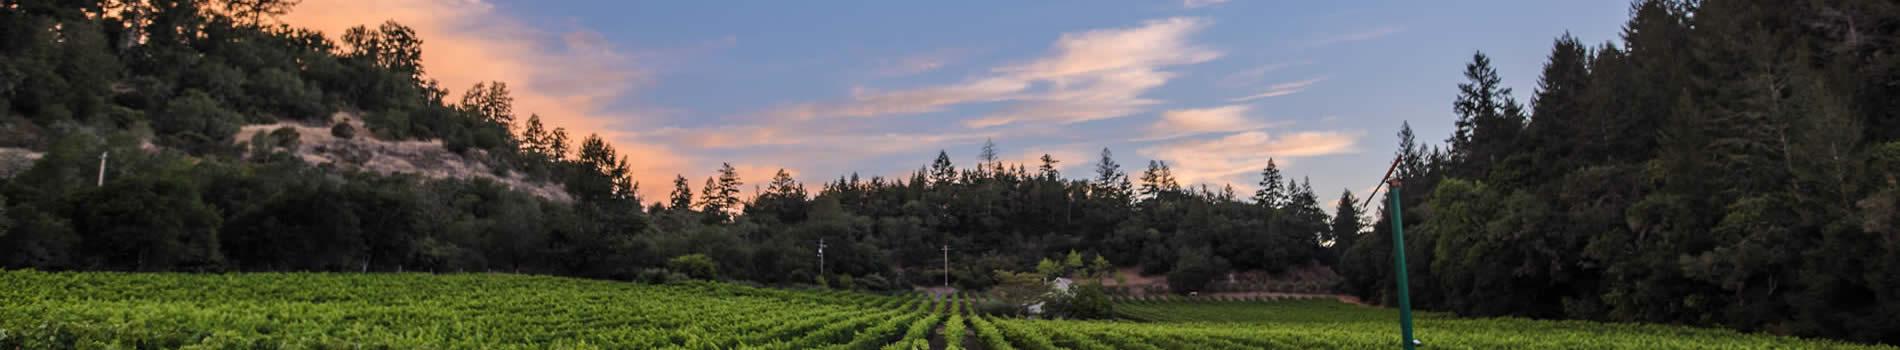 purchase chelsea vineyards wine napa valley ca